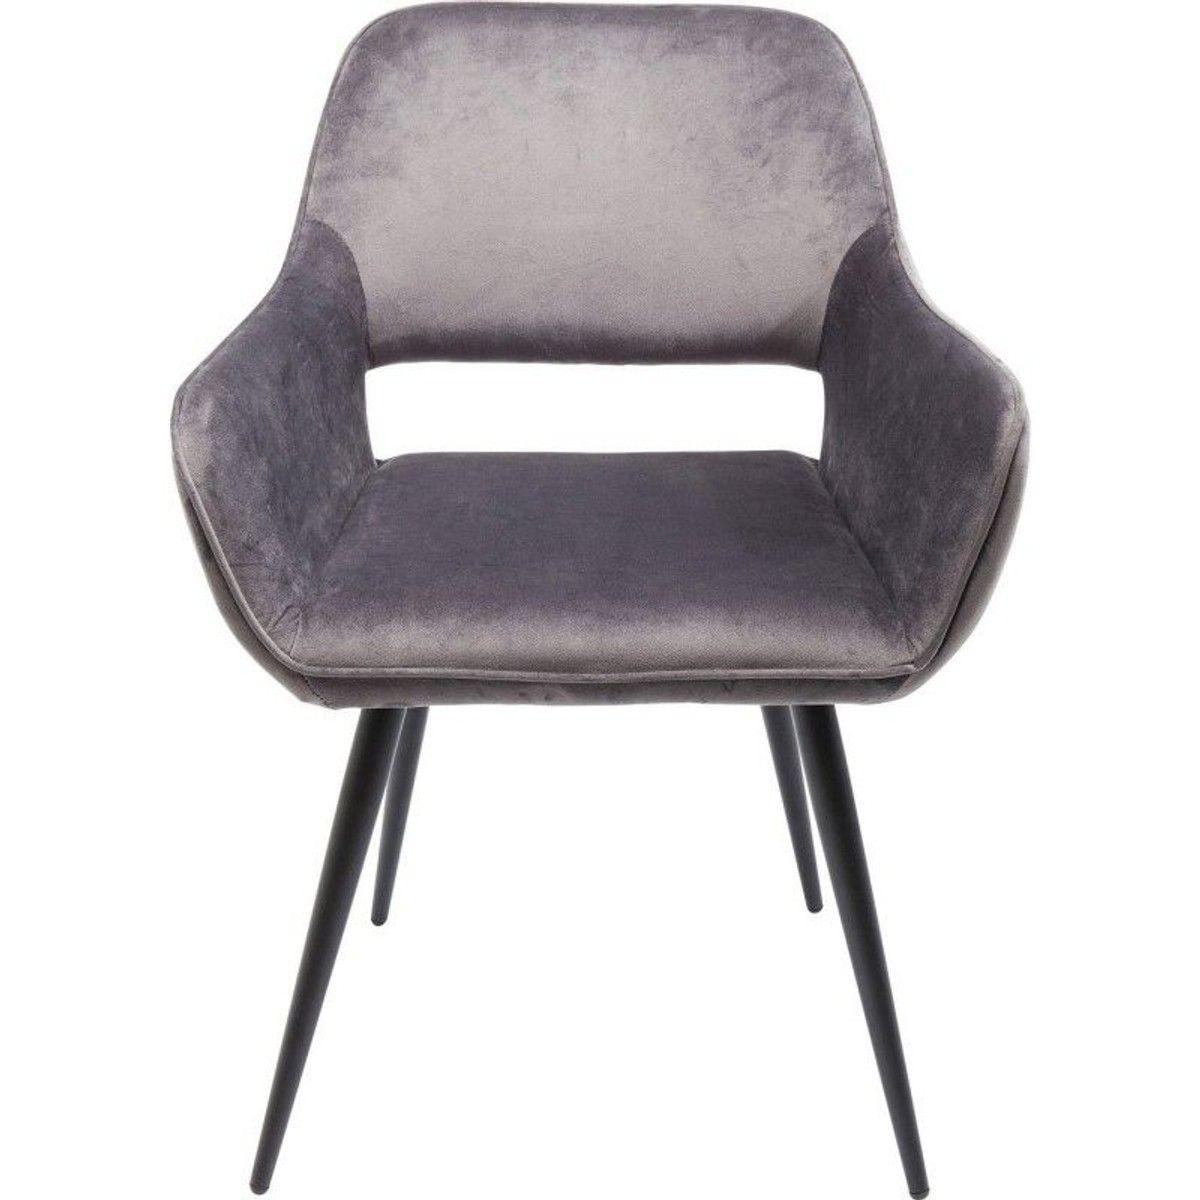 Chaise Avec Accoudoirs San Francisco Velours Stuhle Armlehnstuhl Kare Design